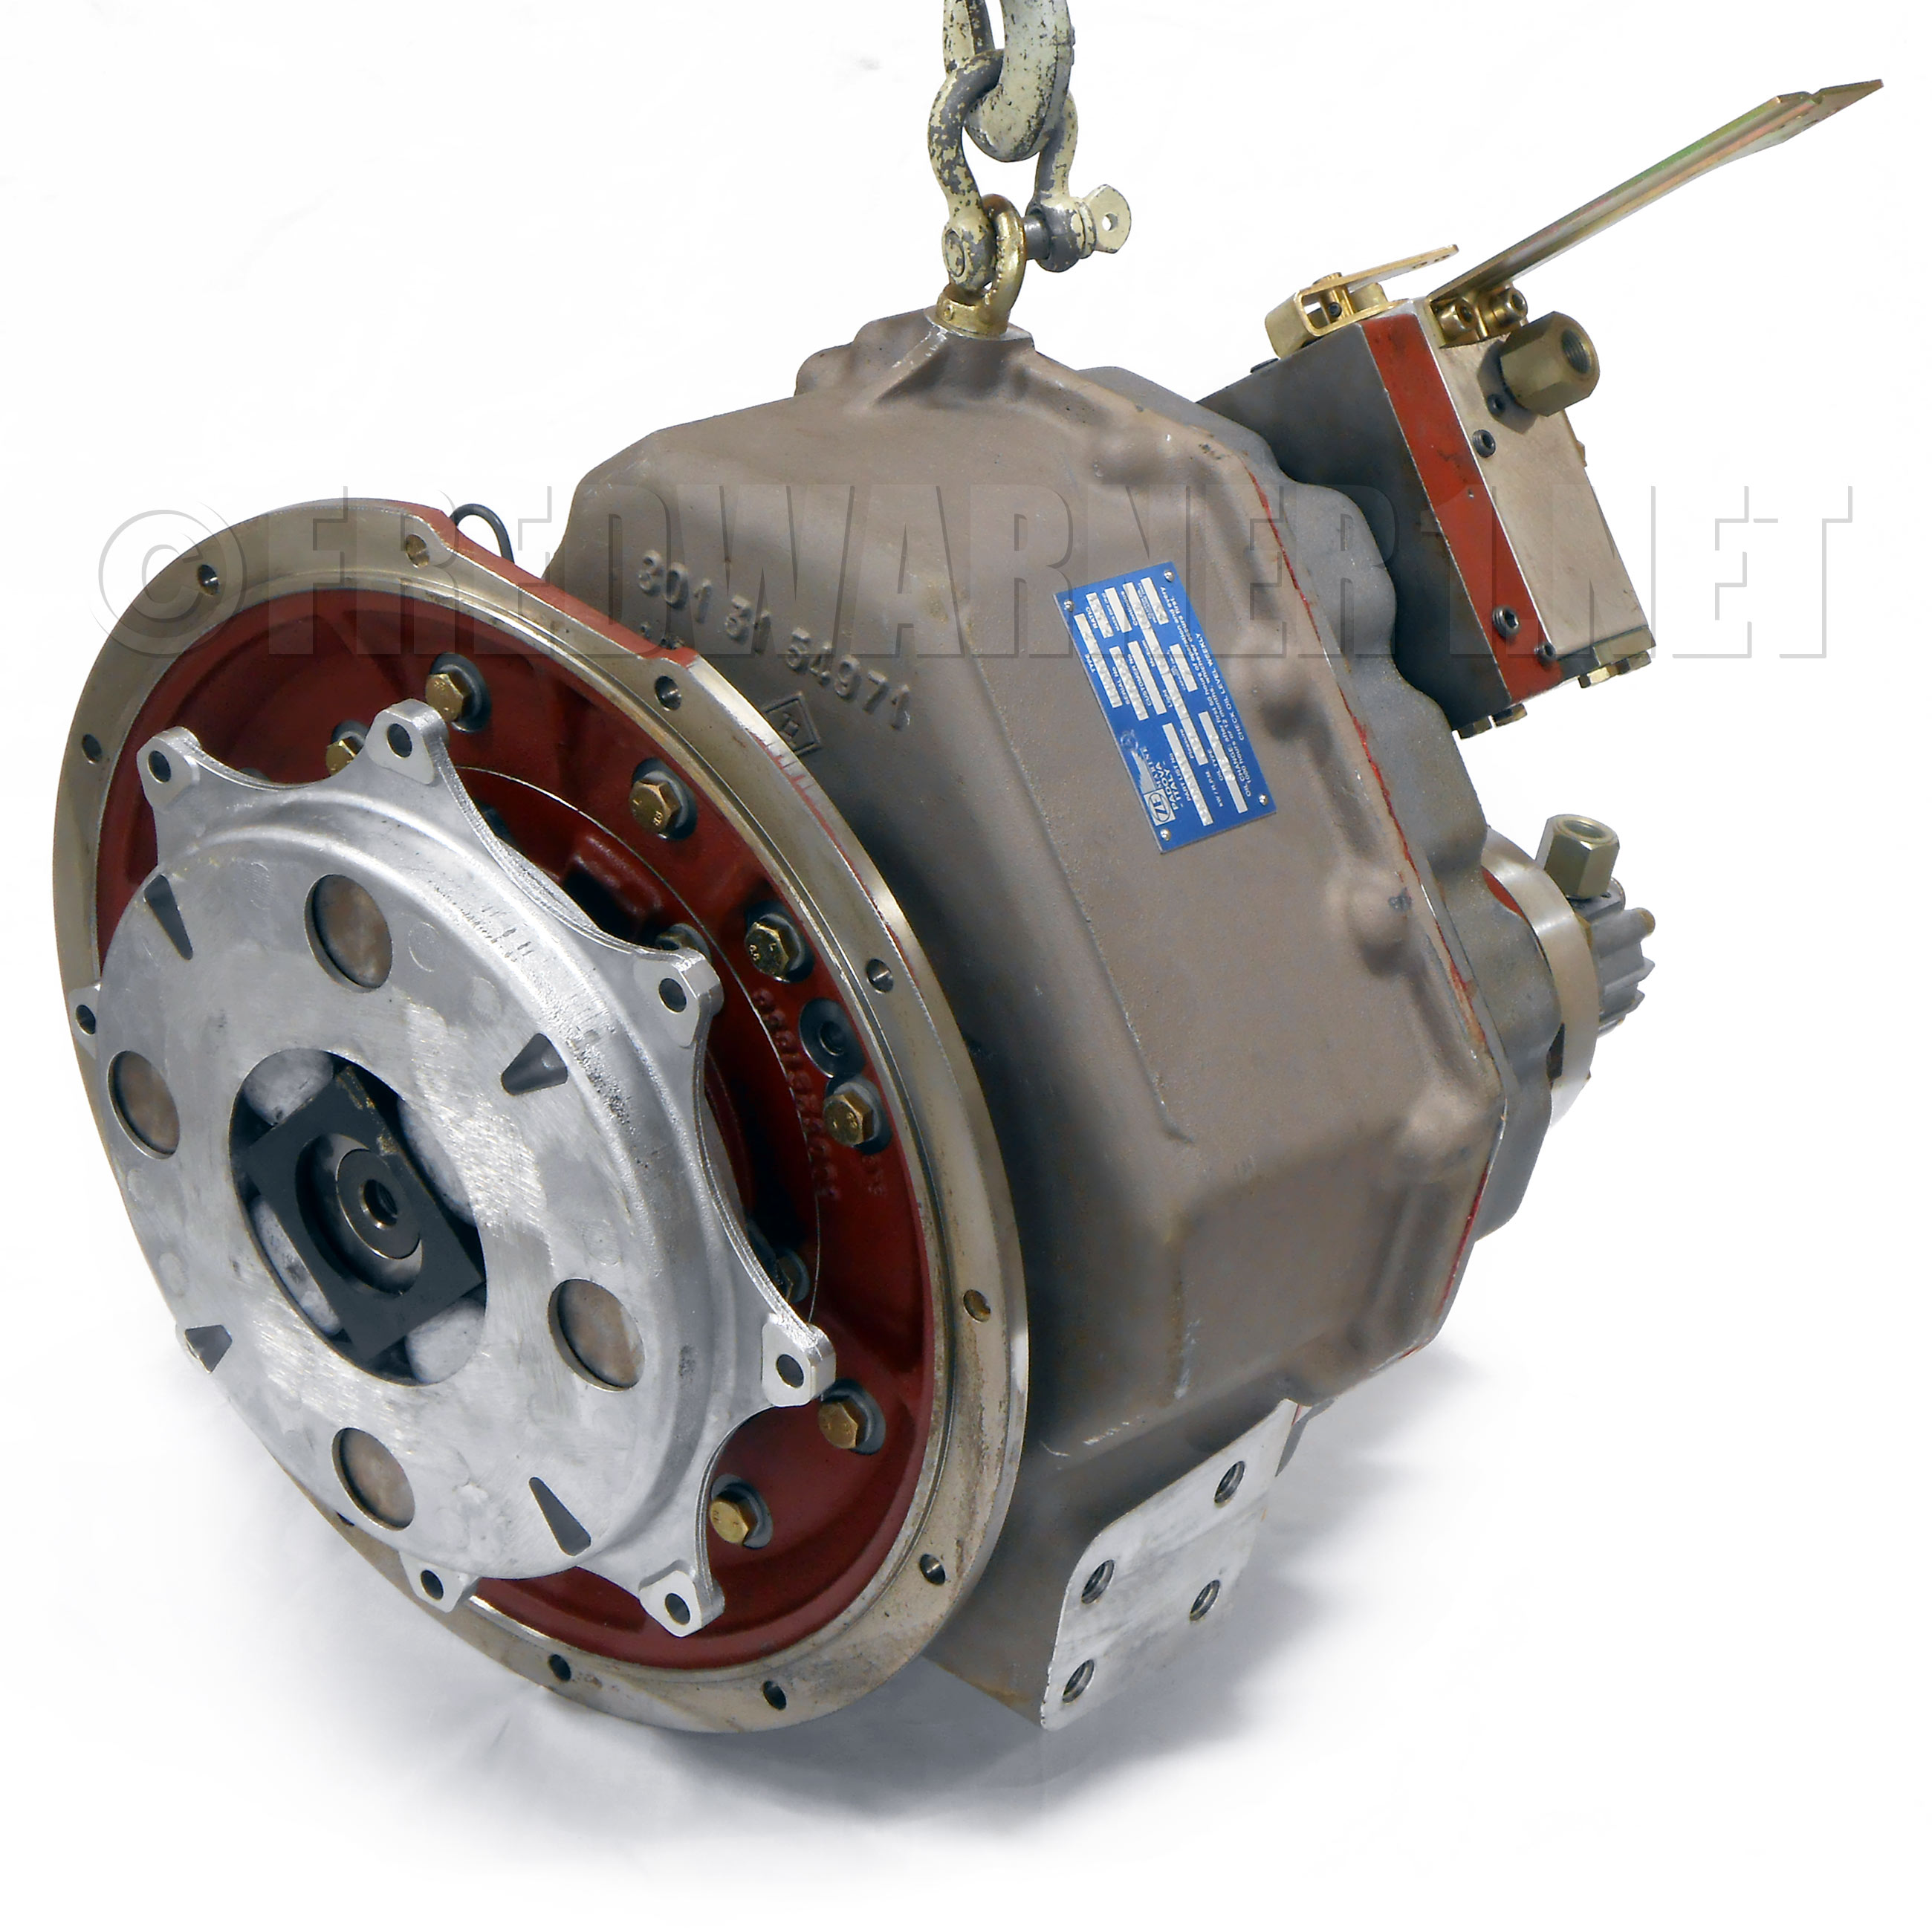 zf 301a marine transmission 1 516 1 mech shift cf ds 45 down angle rh fredwarner1 net